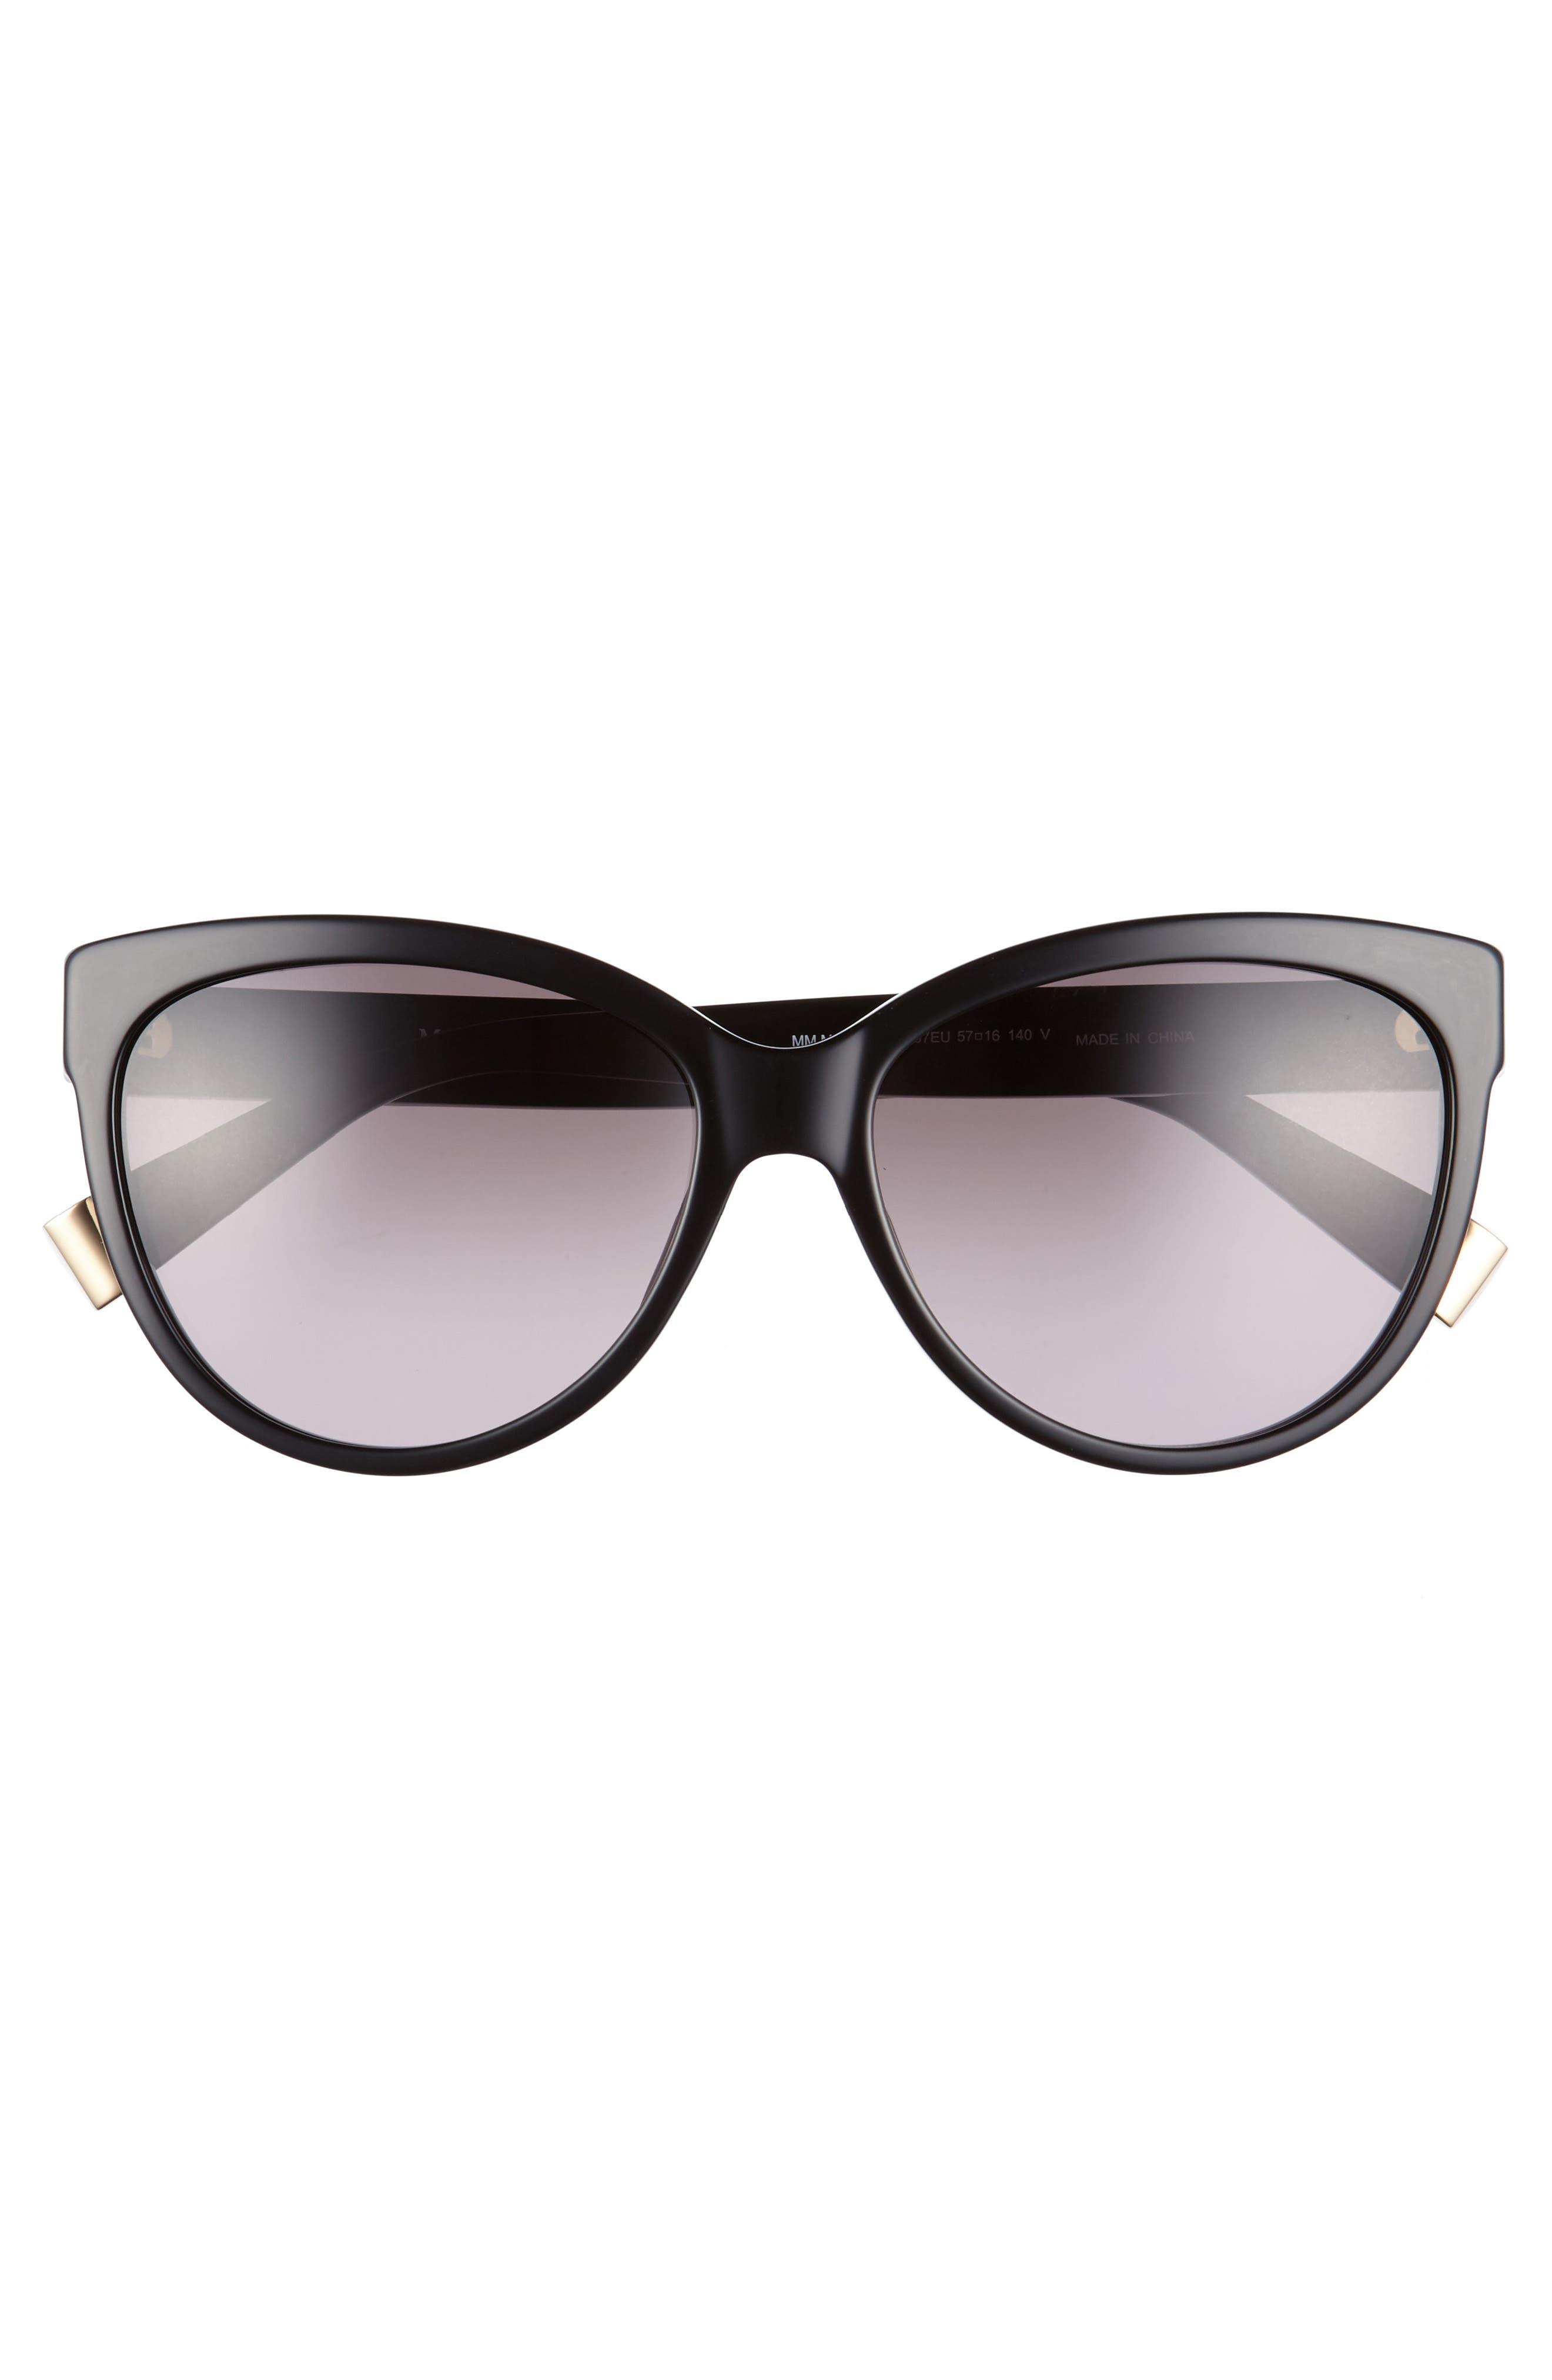 Moderii 57mm Gradient Cat Eye Sunglasses,                             Alternate thumbnail 5, color,